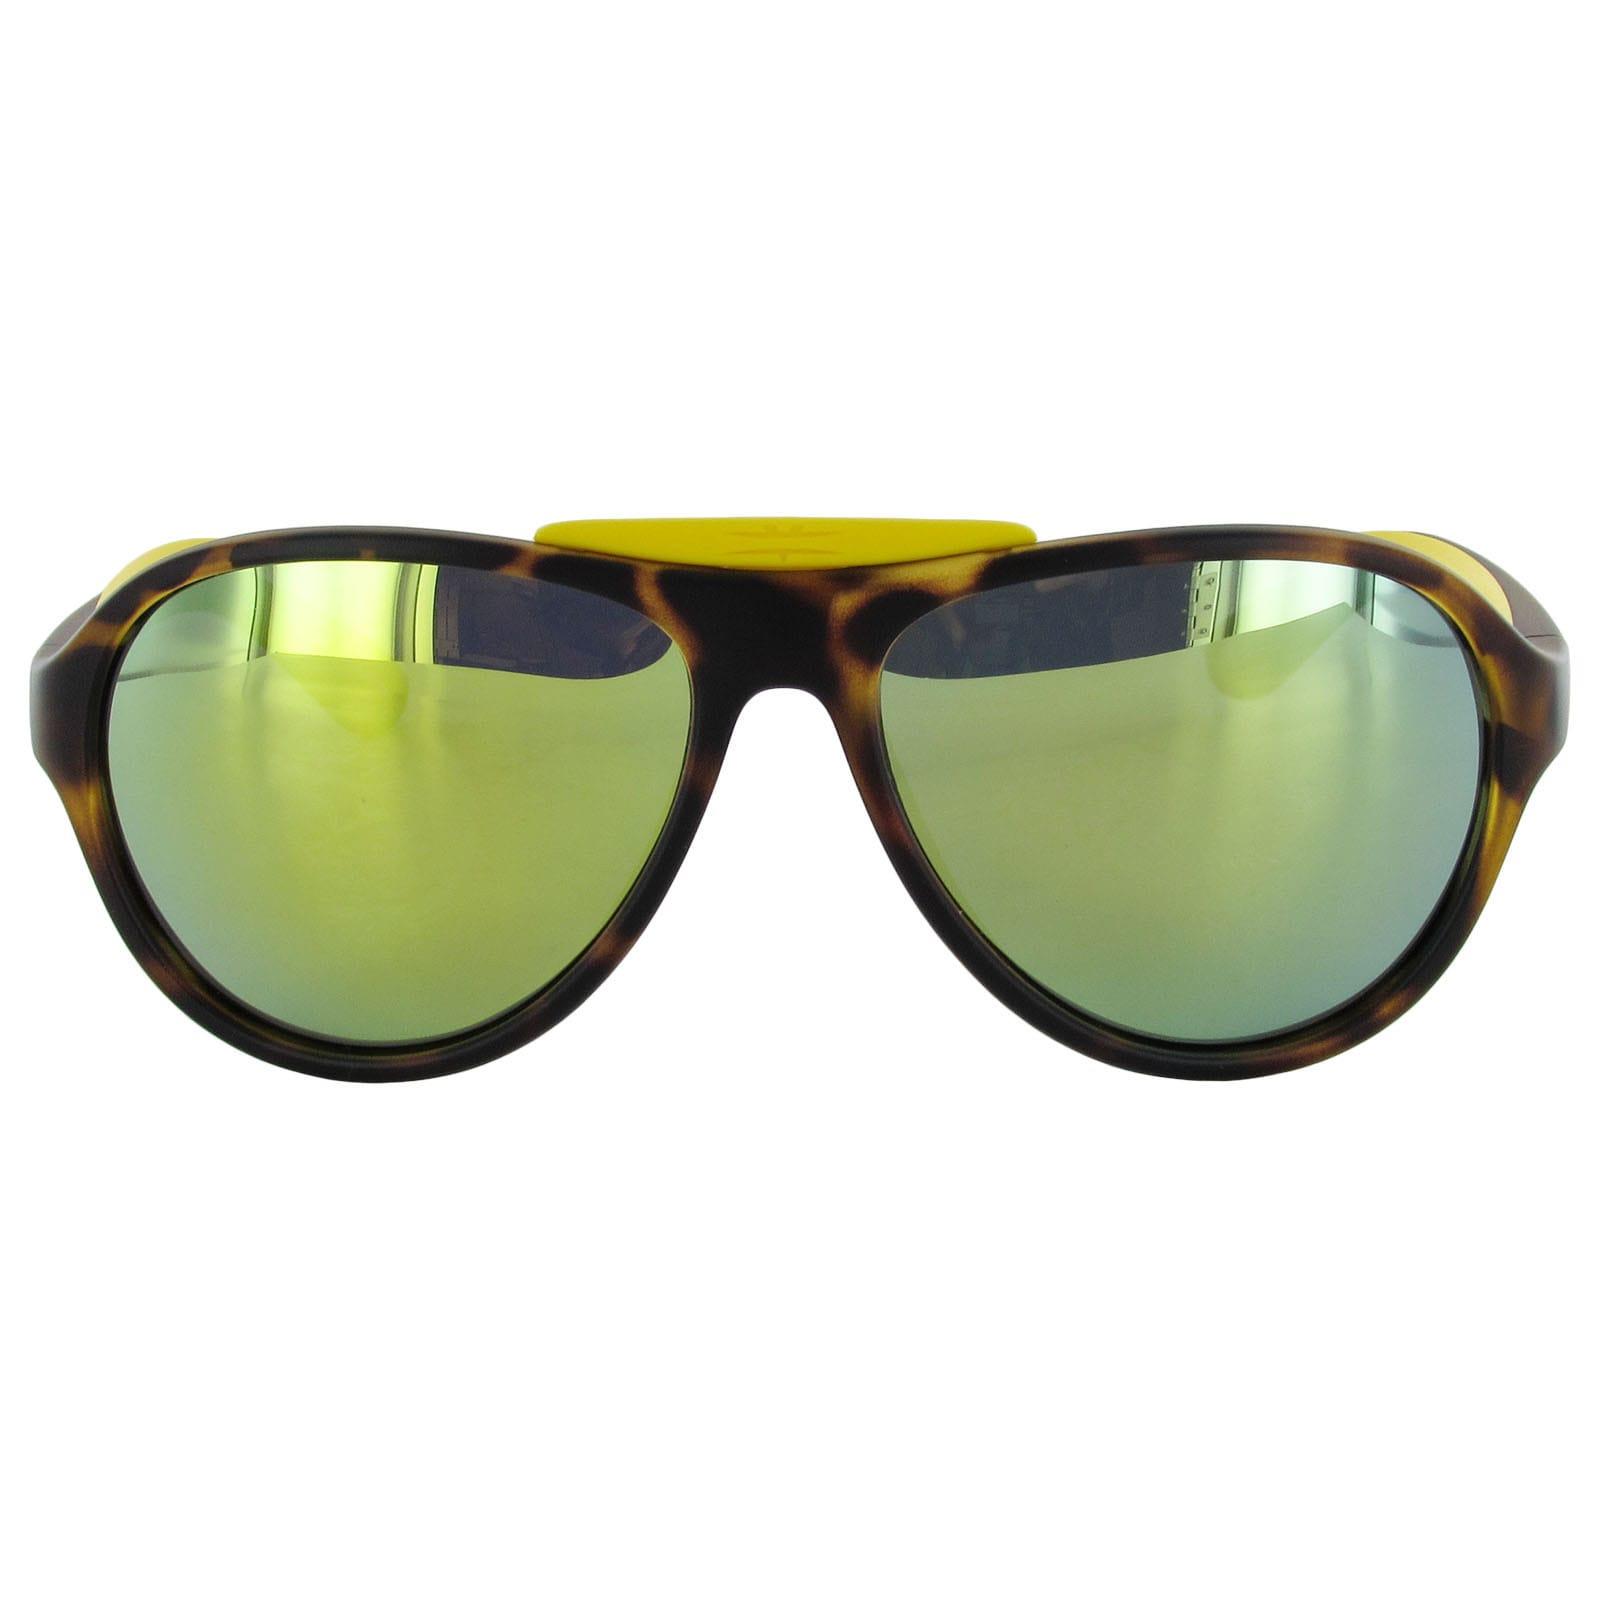 fb6224702220 Shop Vuarnet Extreme Unisex  VE 7008  Oval Polarized Aviator Sunglasses -  Medium - Free Shipping On Orders Over  45 - Overstock - 9561516